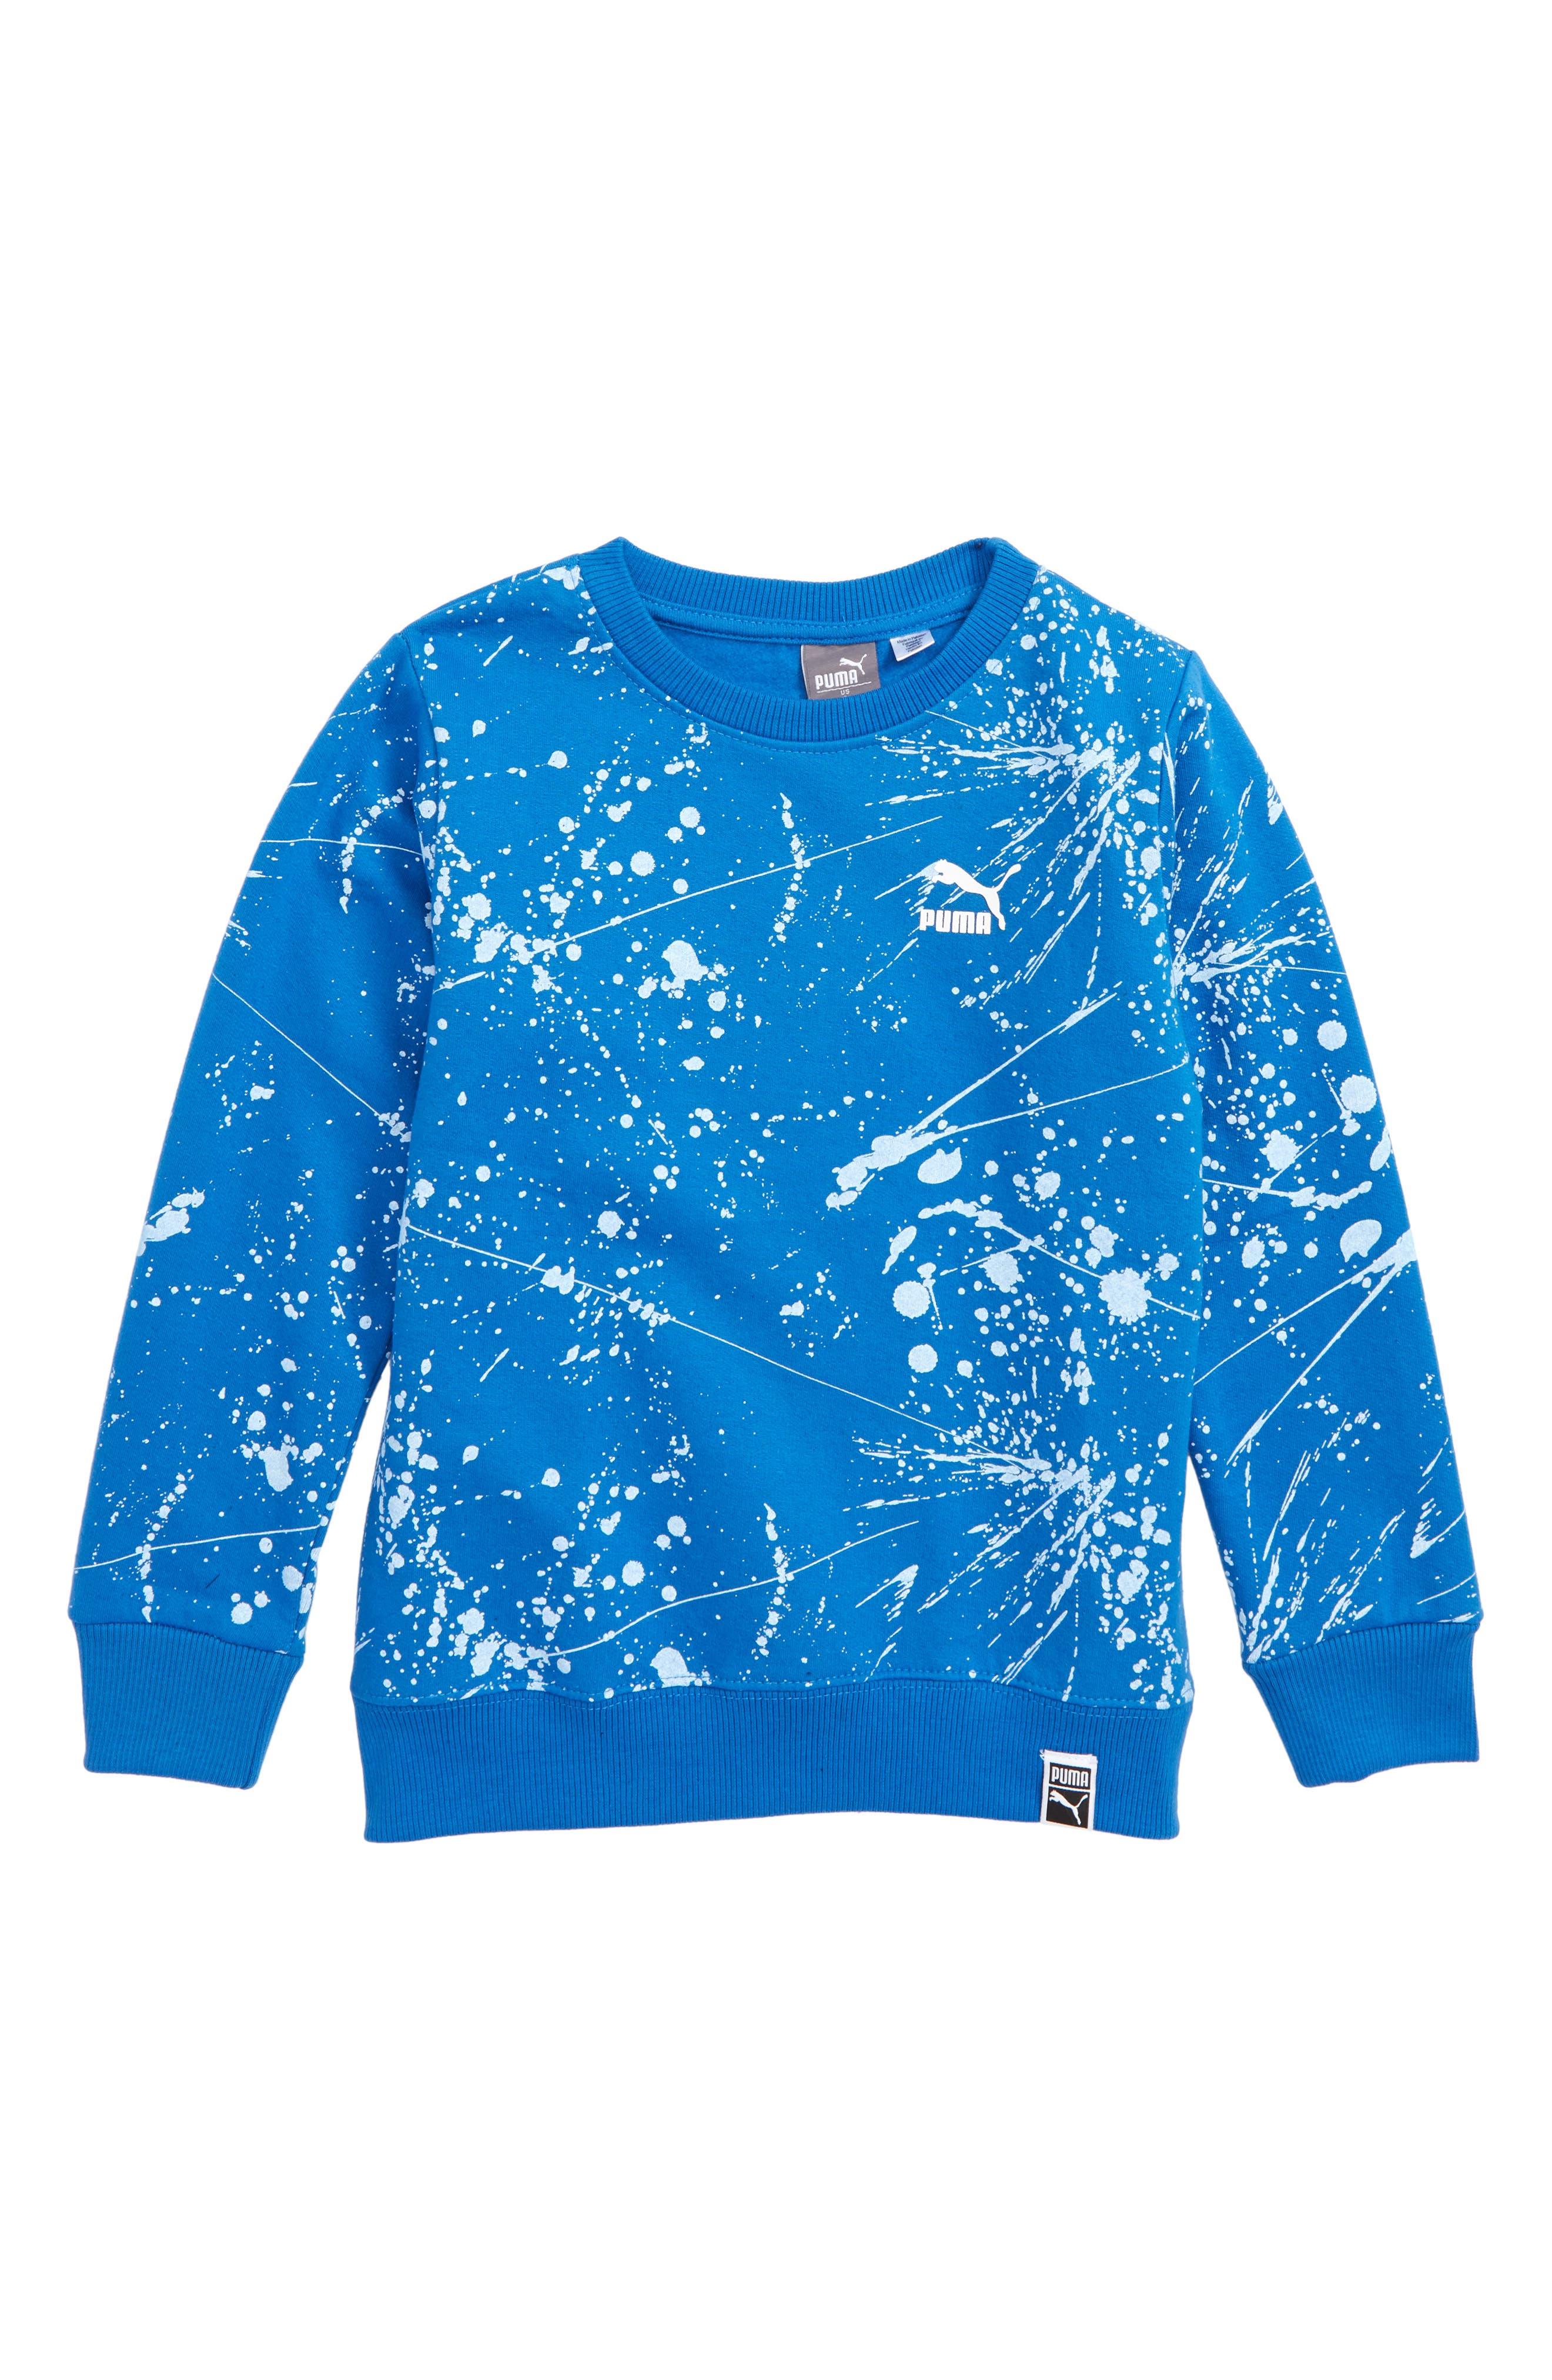 Splatter Fleece Sweatshirt,                             Main thumbnail 1, color,                             STRONG BLUE